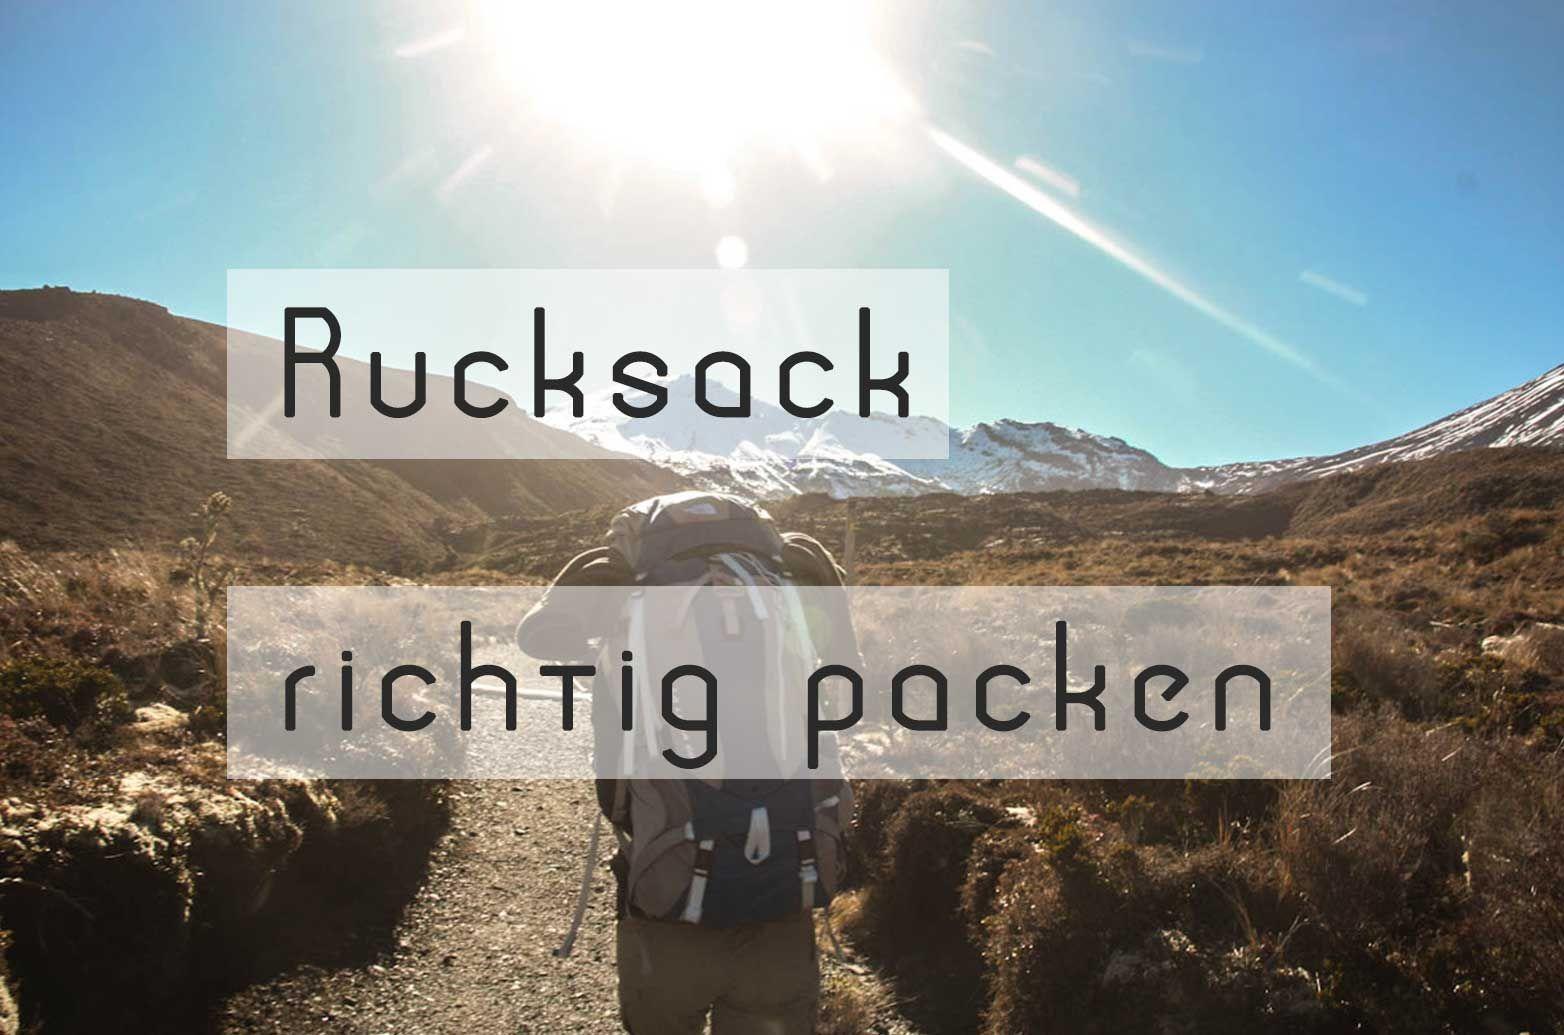 Den #Rucksack richtig packen: 6 ultimative Tipps ...